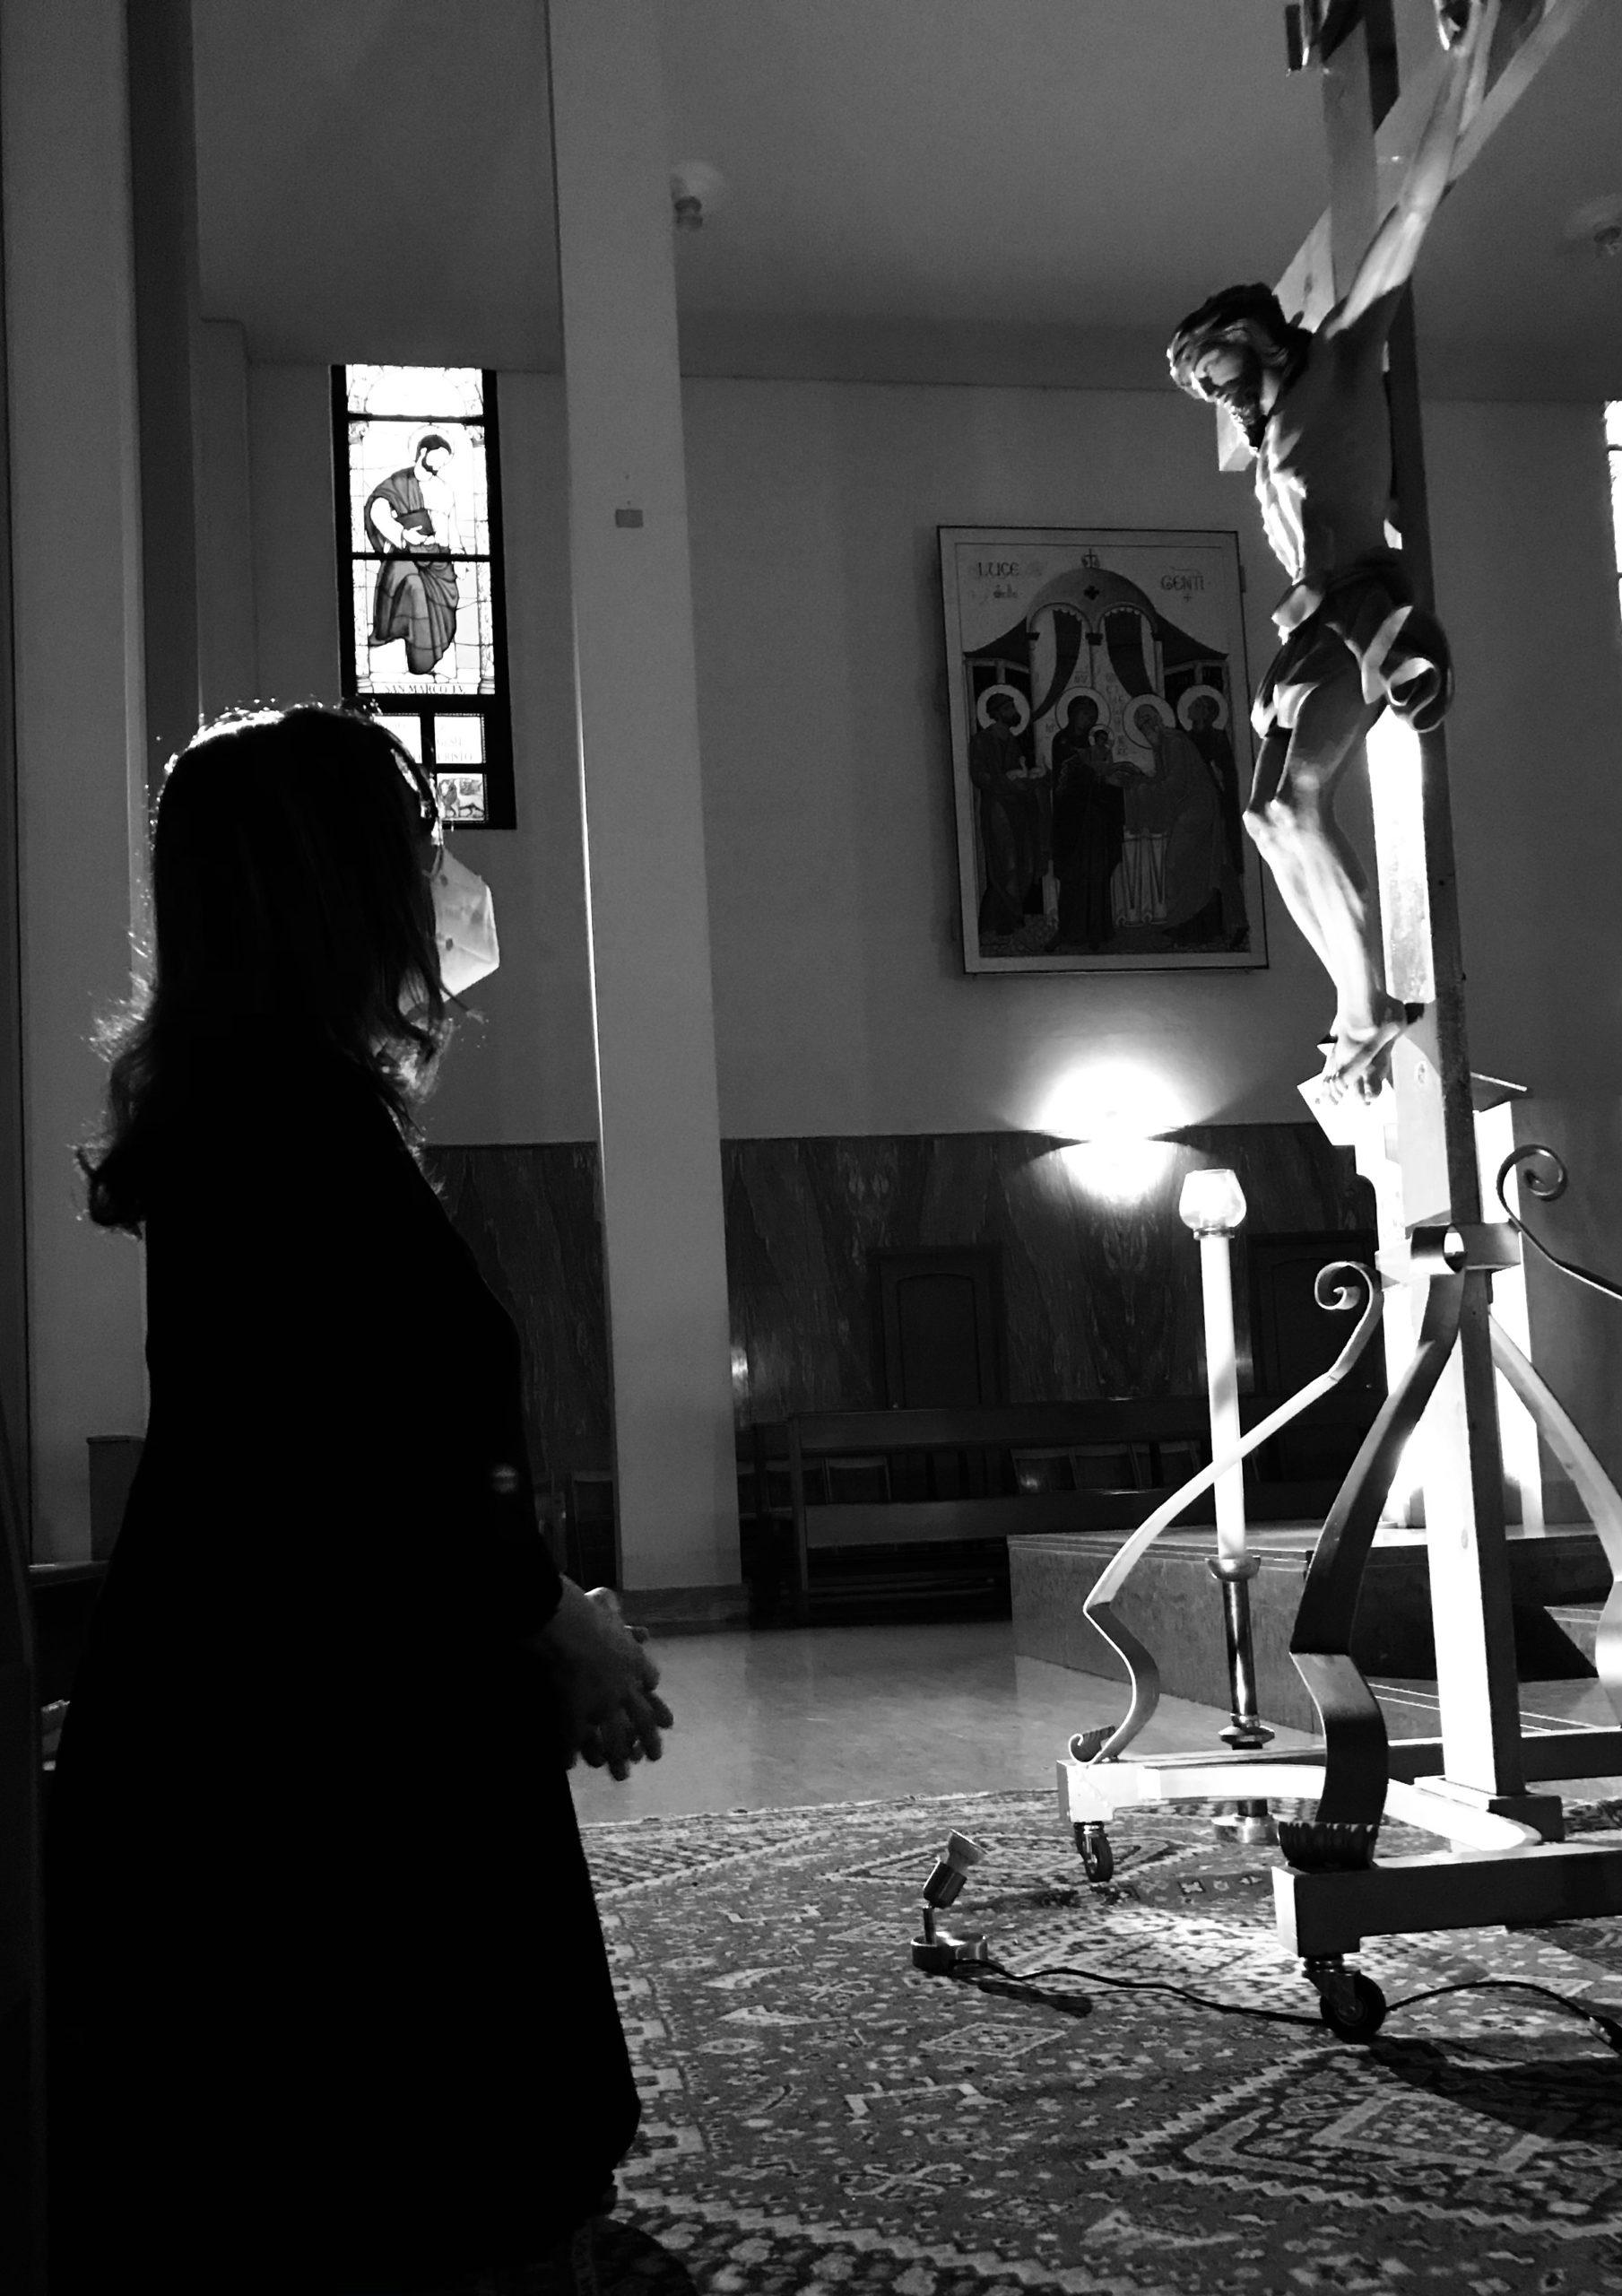 scatta in parrocchia 2021, gianluca de mutiis, santissimo sacramento a tor de schiavi